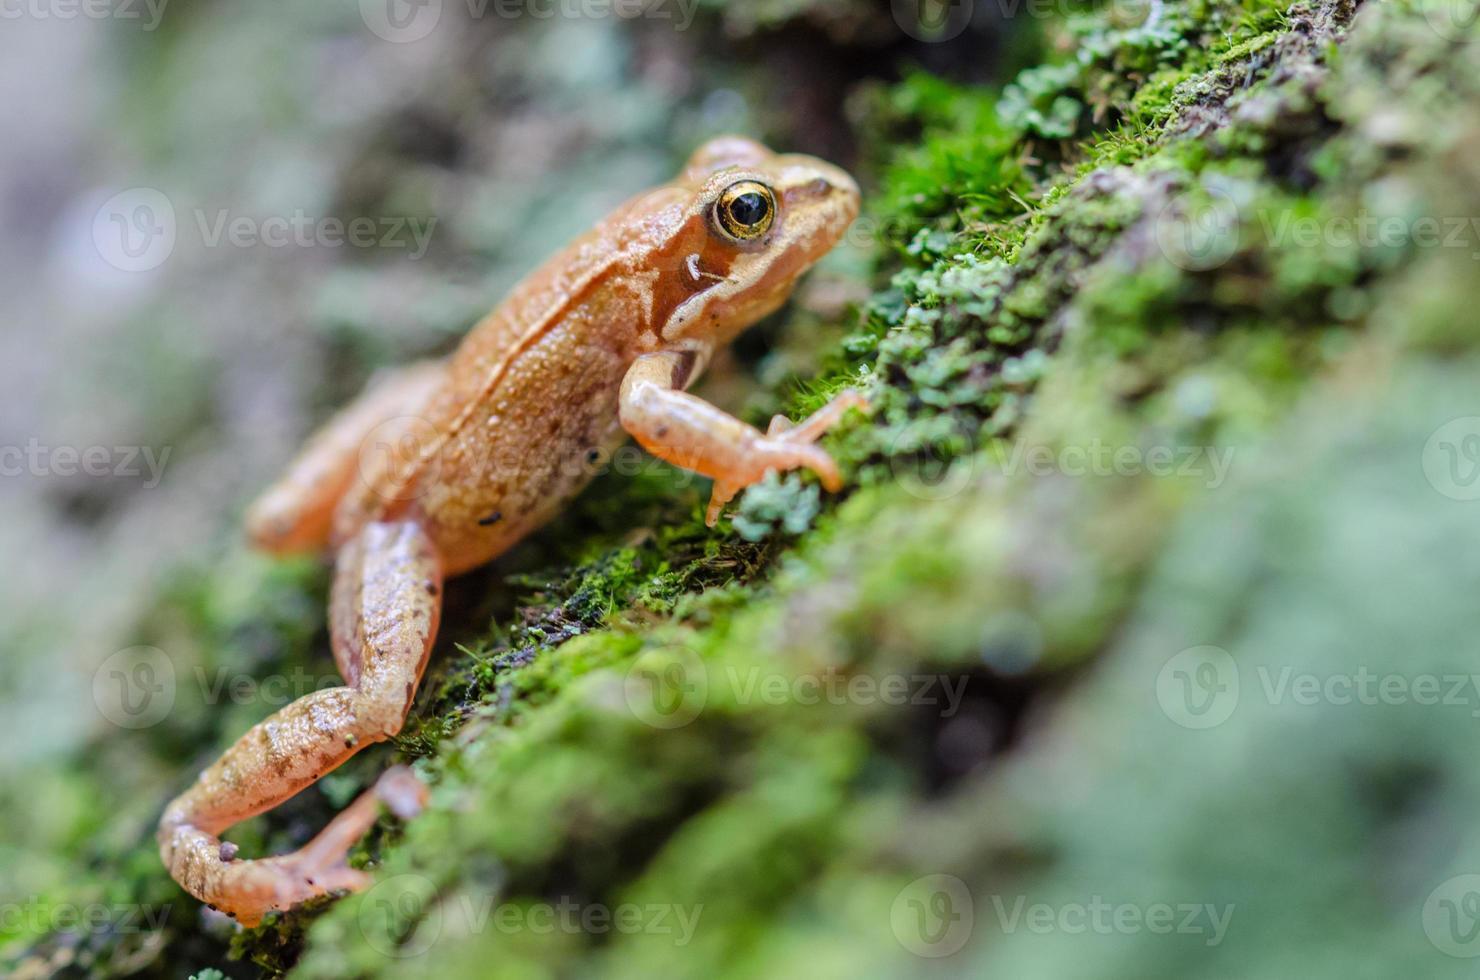 grenouille rousse photo